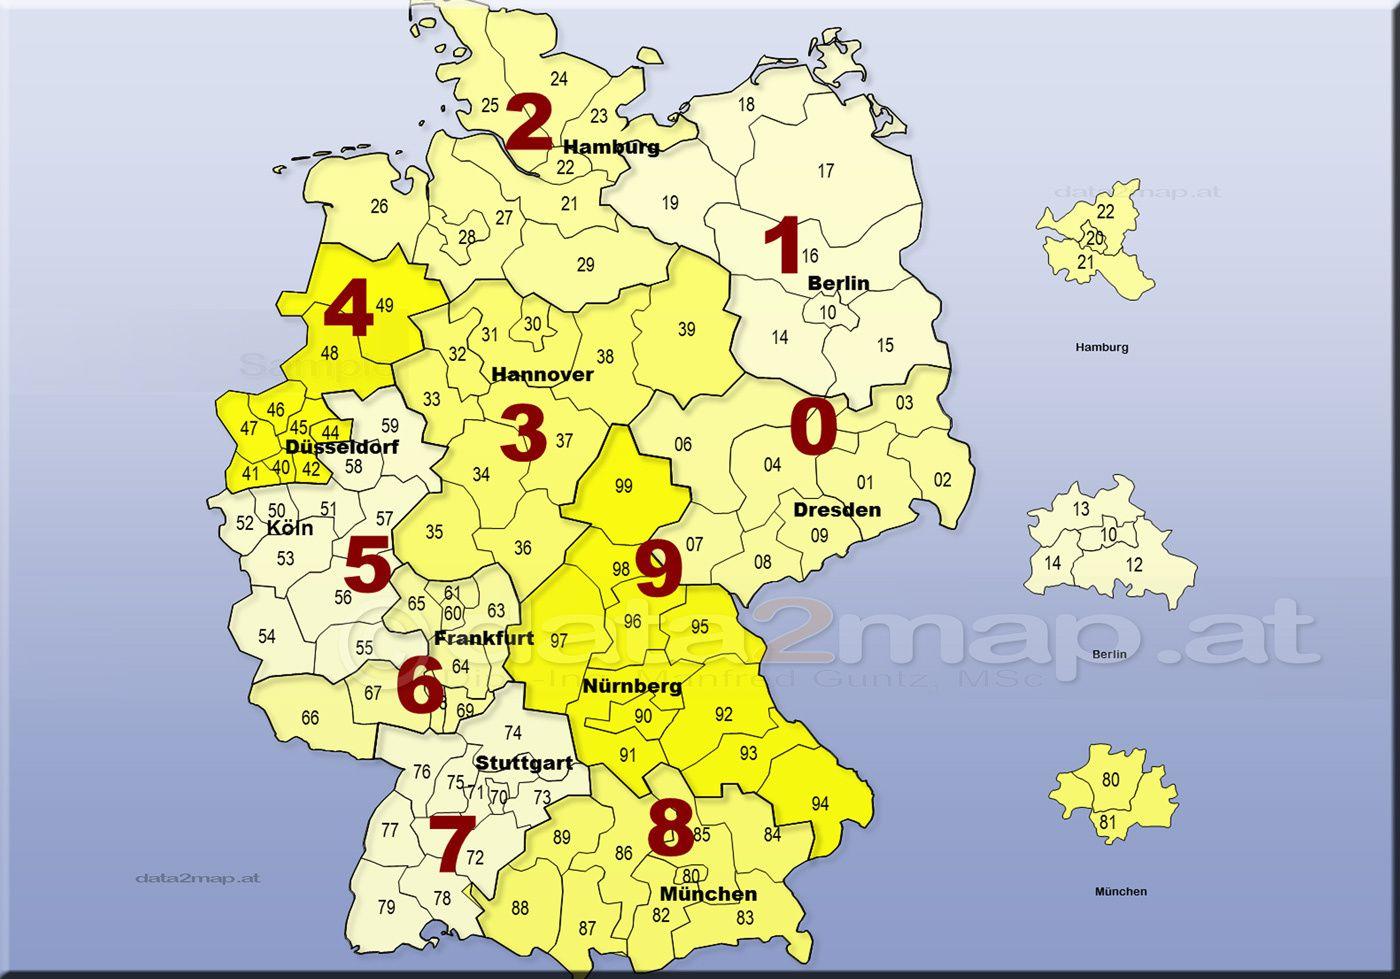 Karte Plz.Deutschland Karte Plz Deutschland Karte Freche Bilder Karte